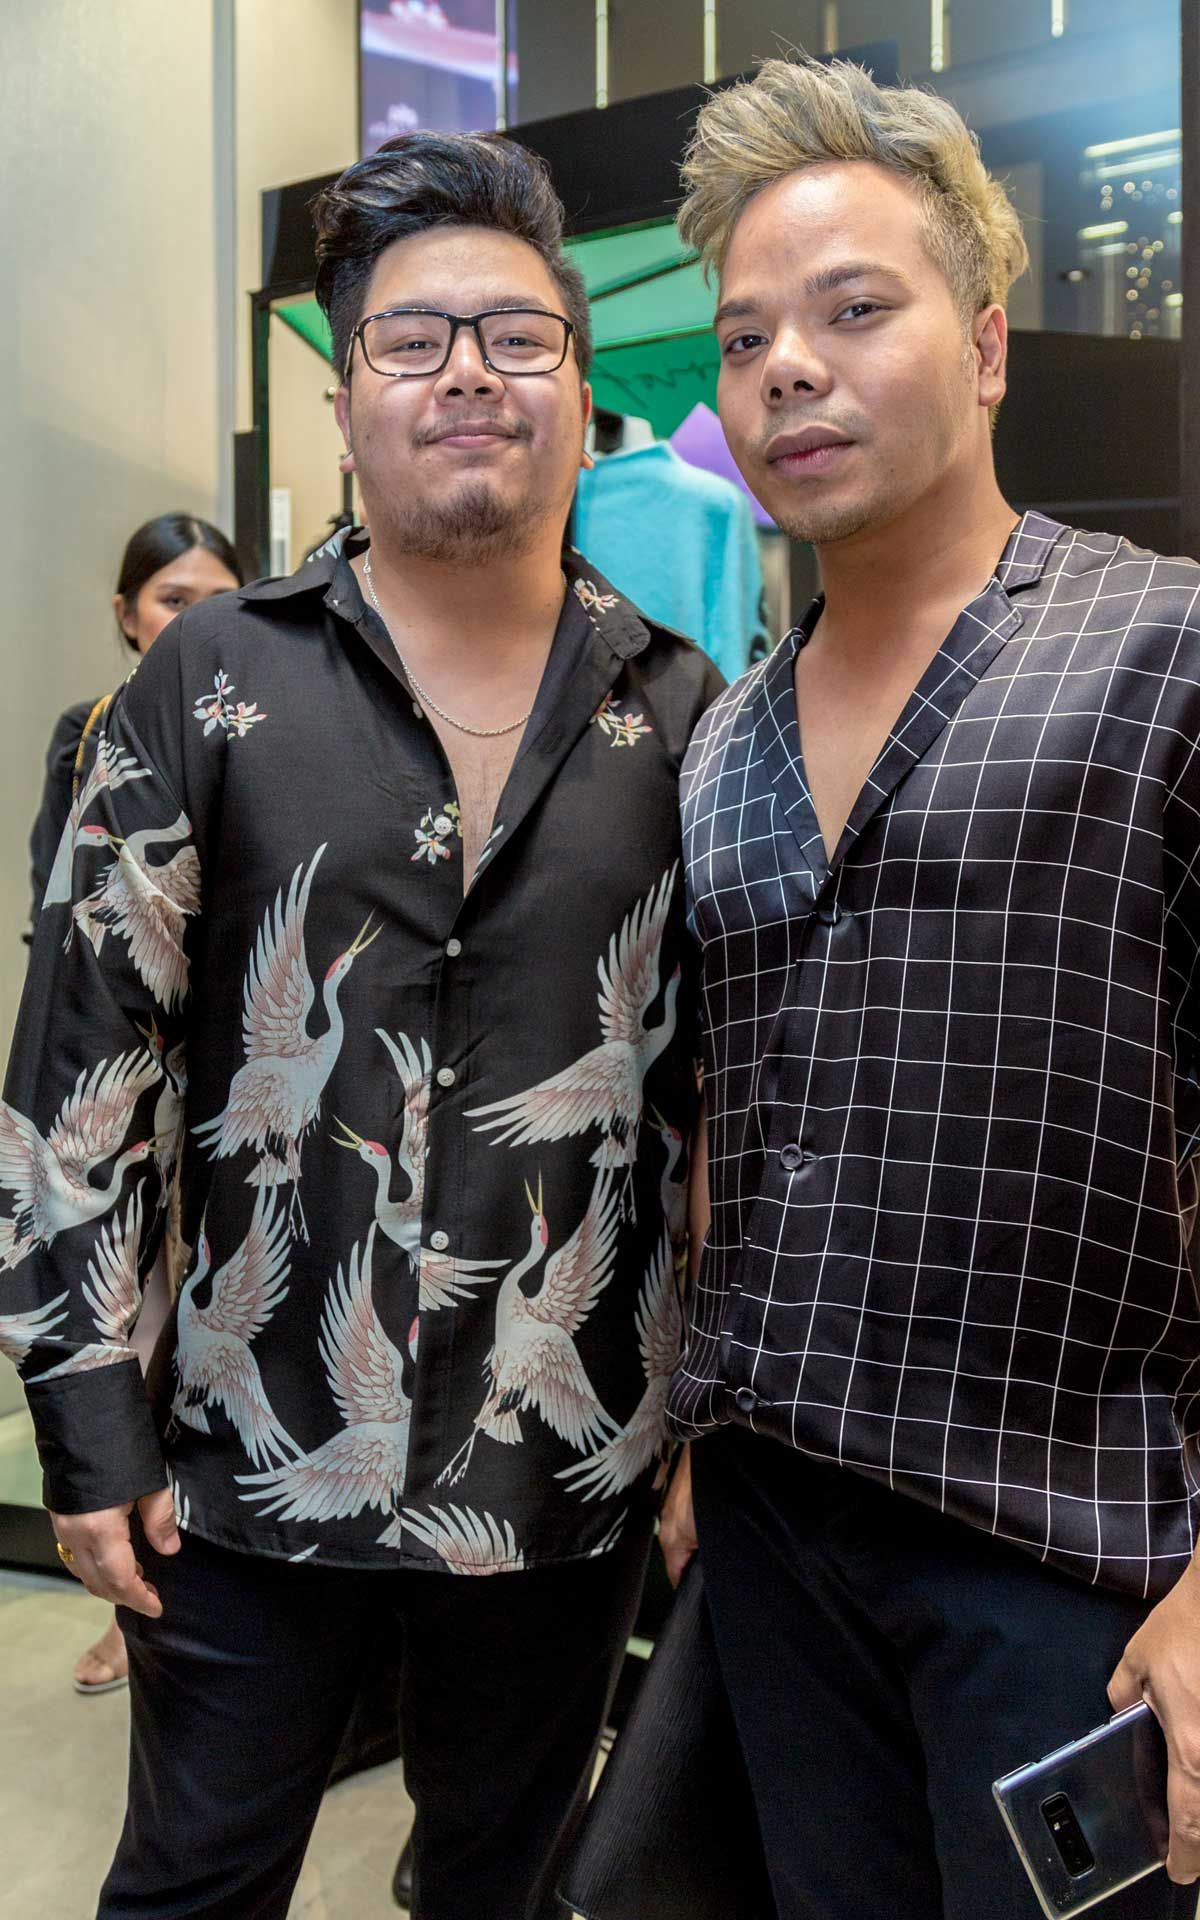 Mohd Hafizi Radzi Woo and Izree Kai Haffiz